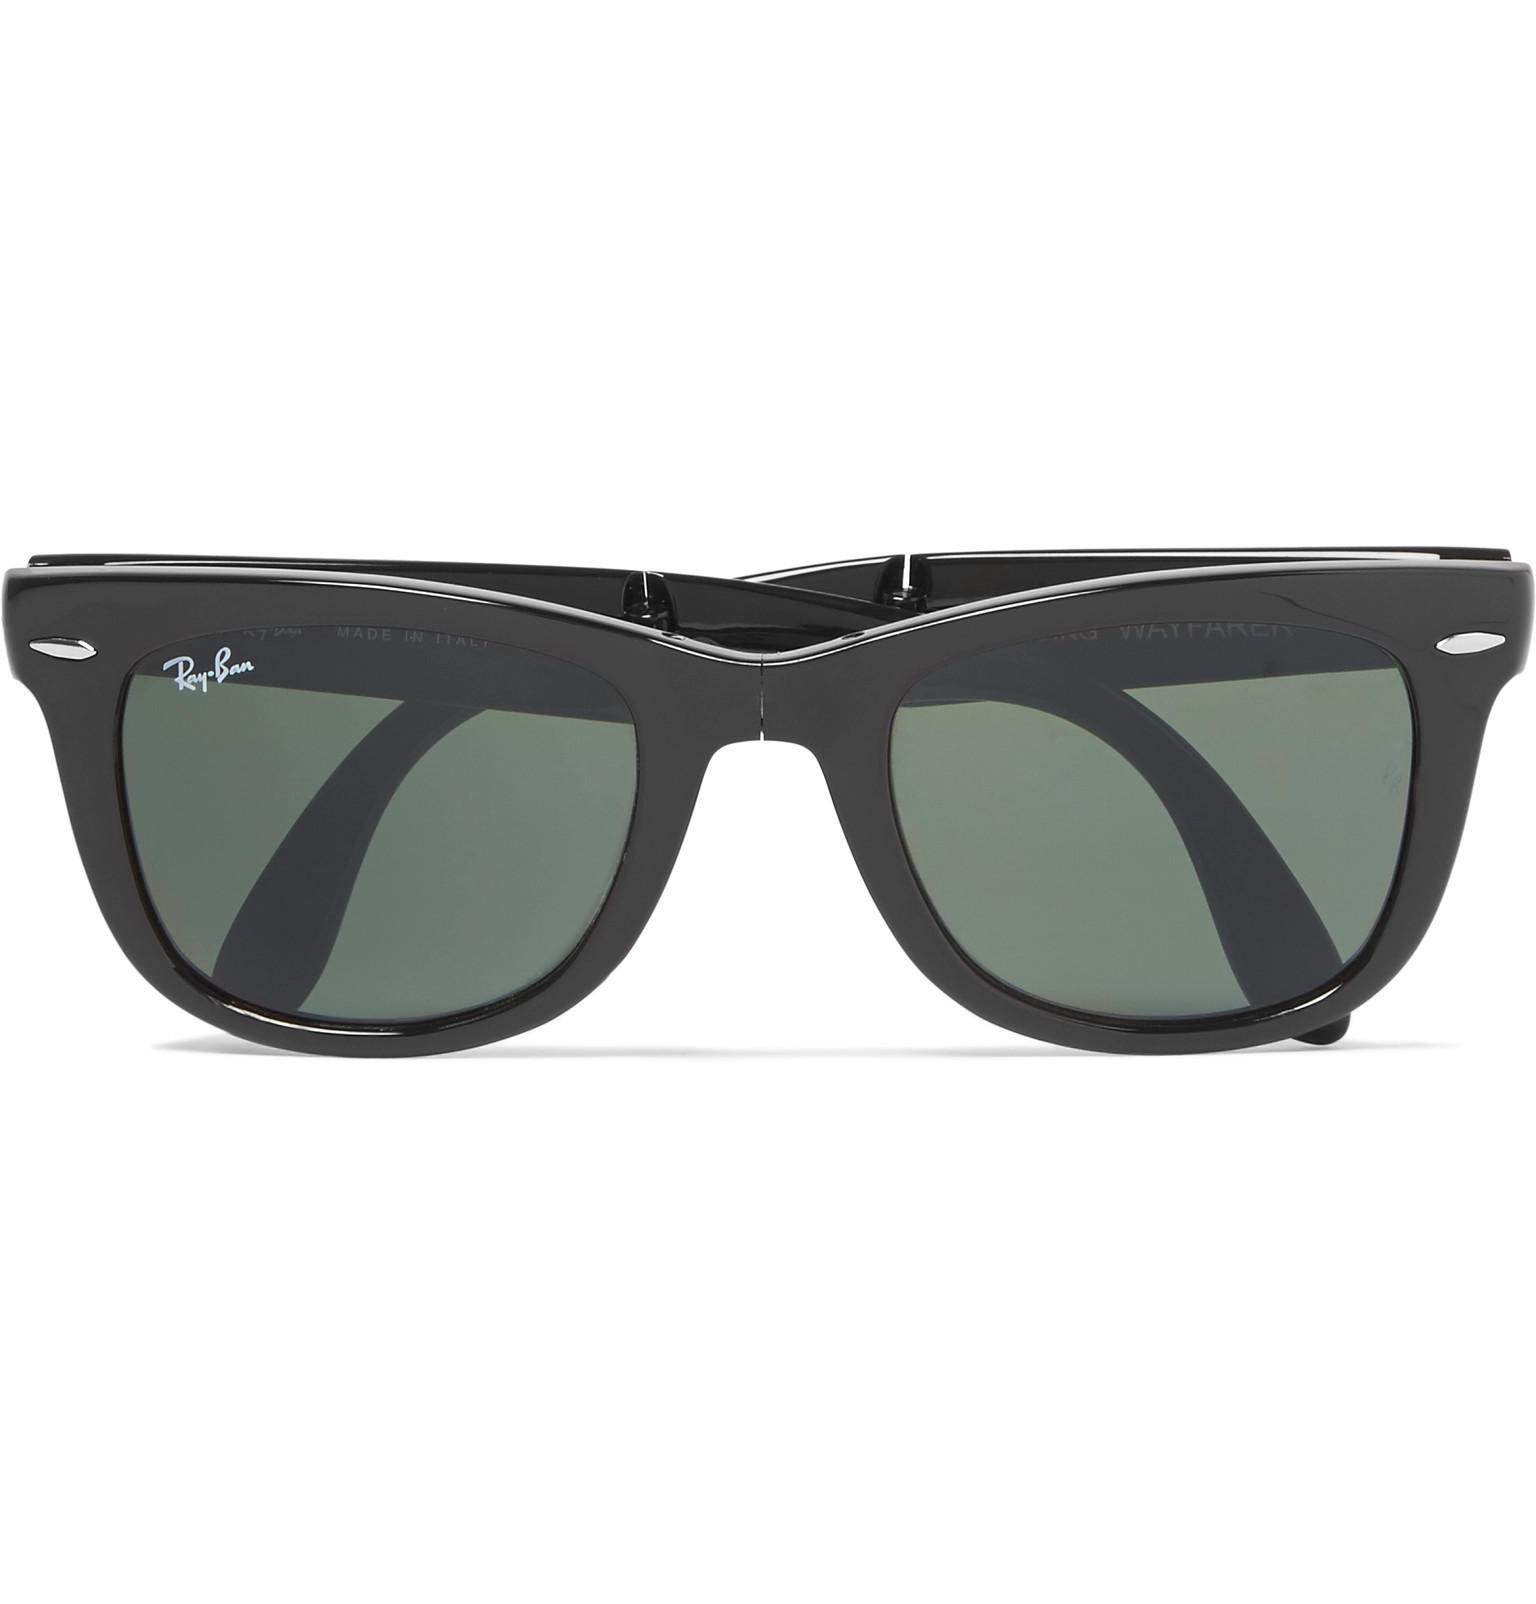 57d49c6df10f7 Ray-Ban - Wayfarer Folding Acetate Sunglasses